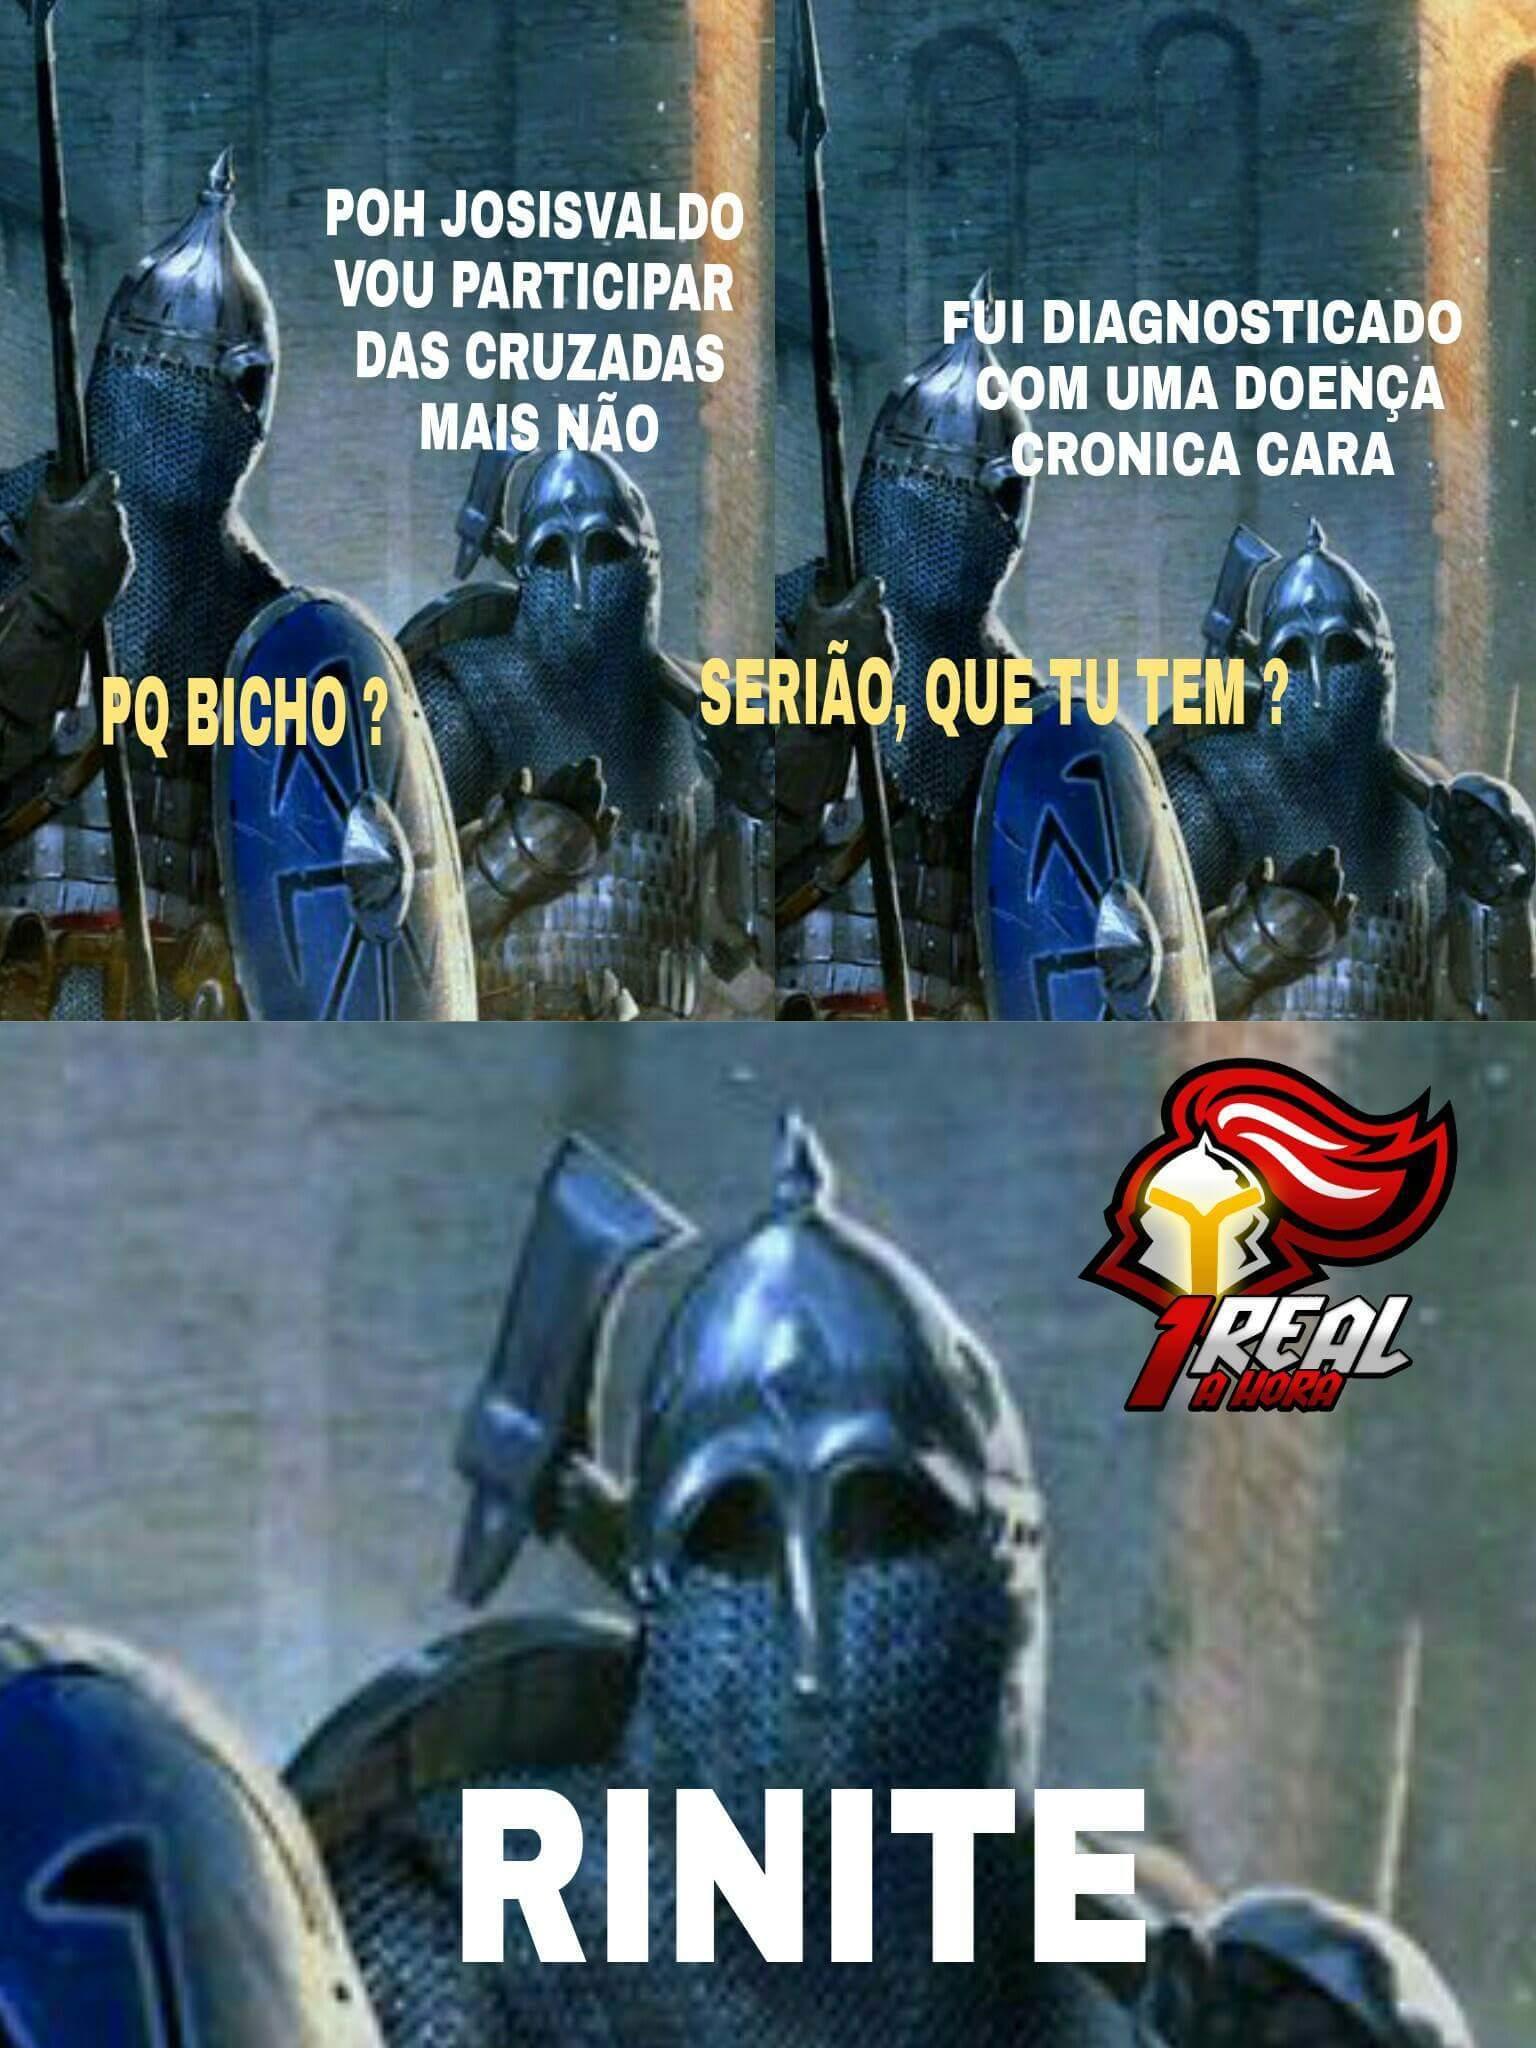 Baduntssss. DEUS VULT! - meme